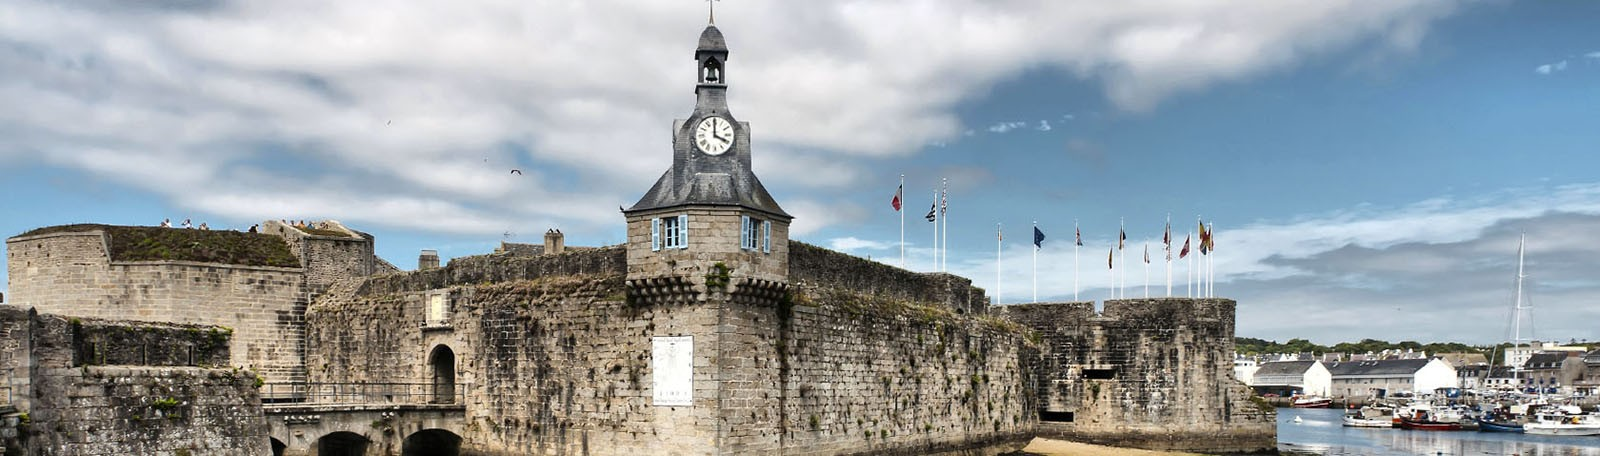 Stationner à Brest Coat Ar Gueven